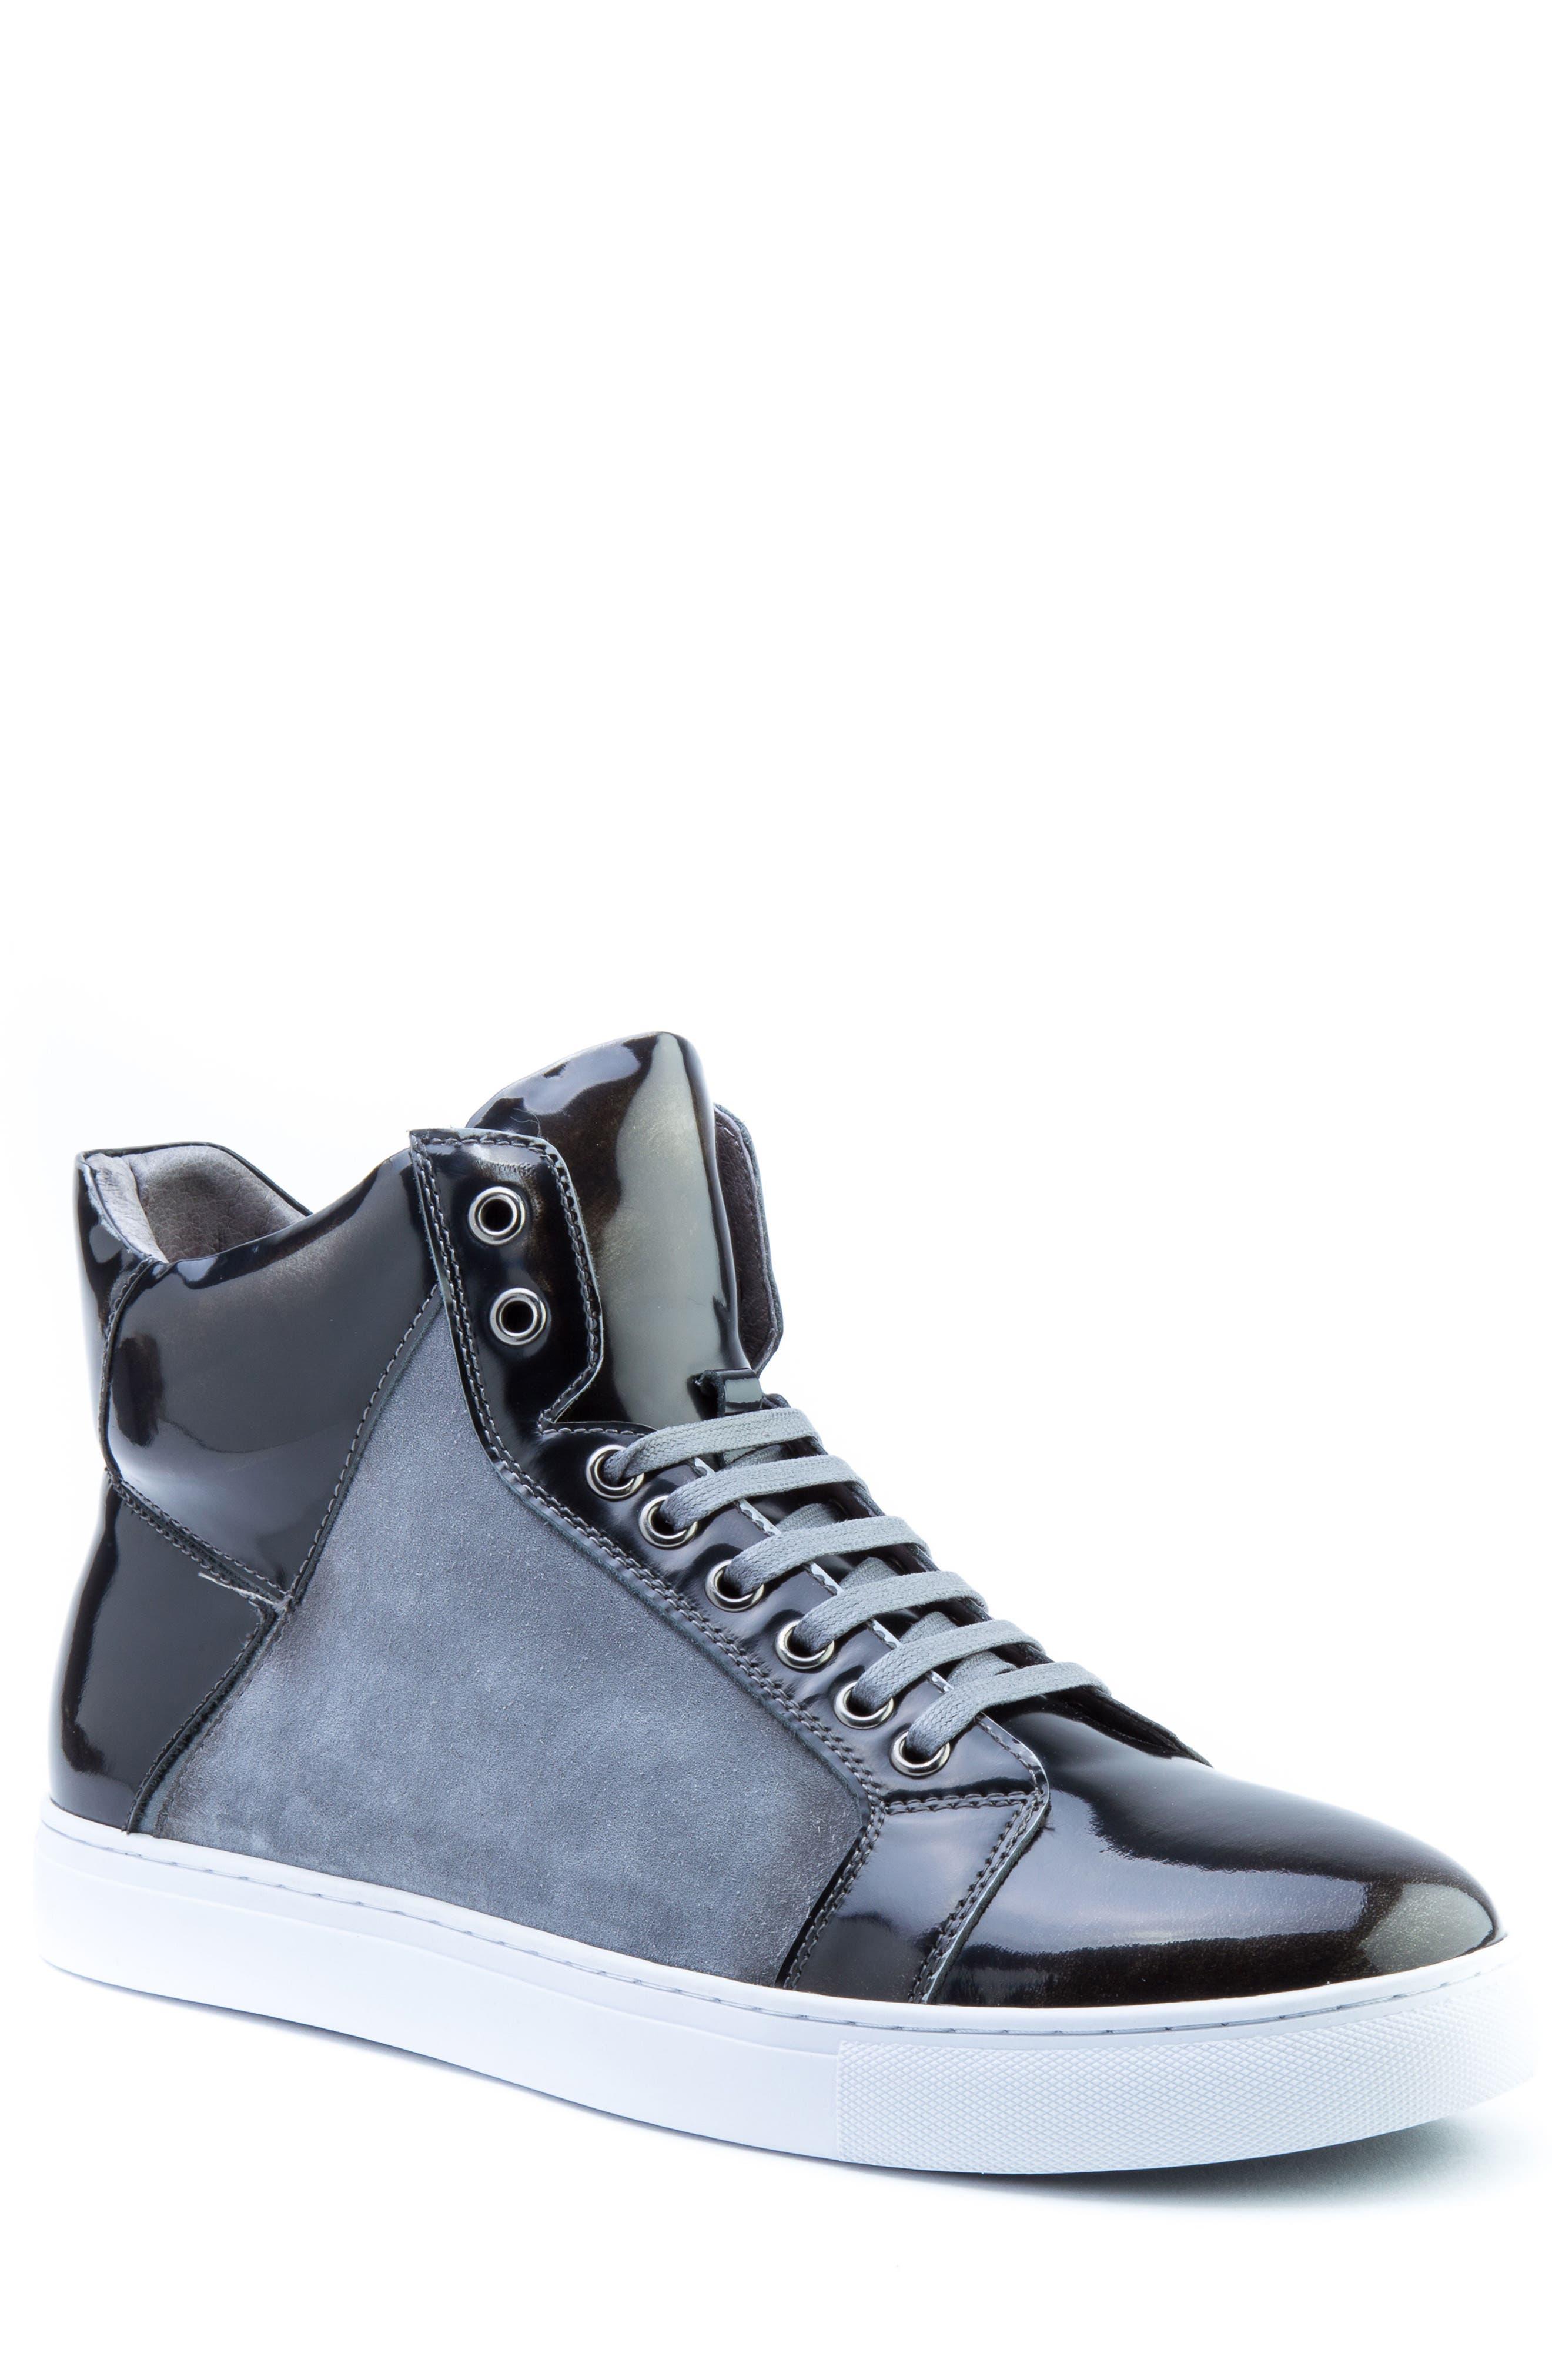 BADGLEY MISCHKA COLLECTION, Badgley Mischka Douglas High Top Sneaker, Main thumbnail 1, color, 001